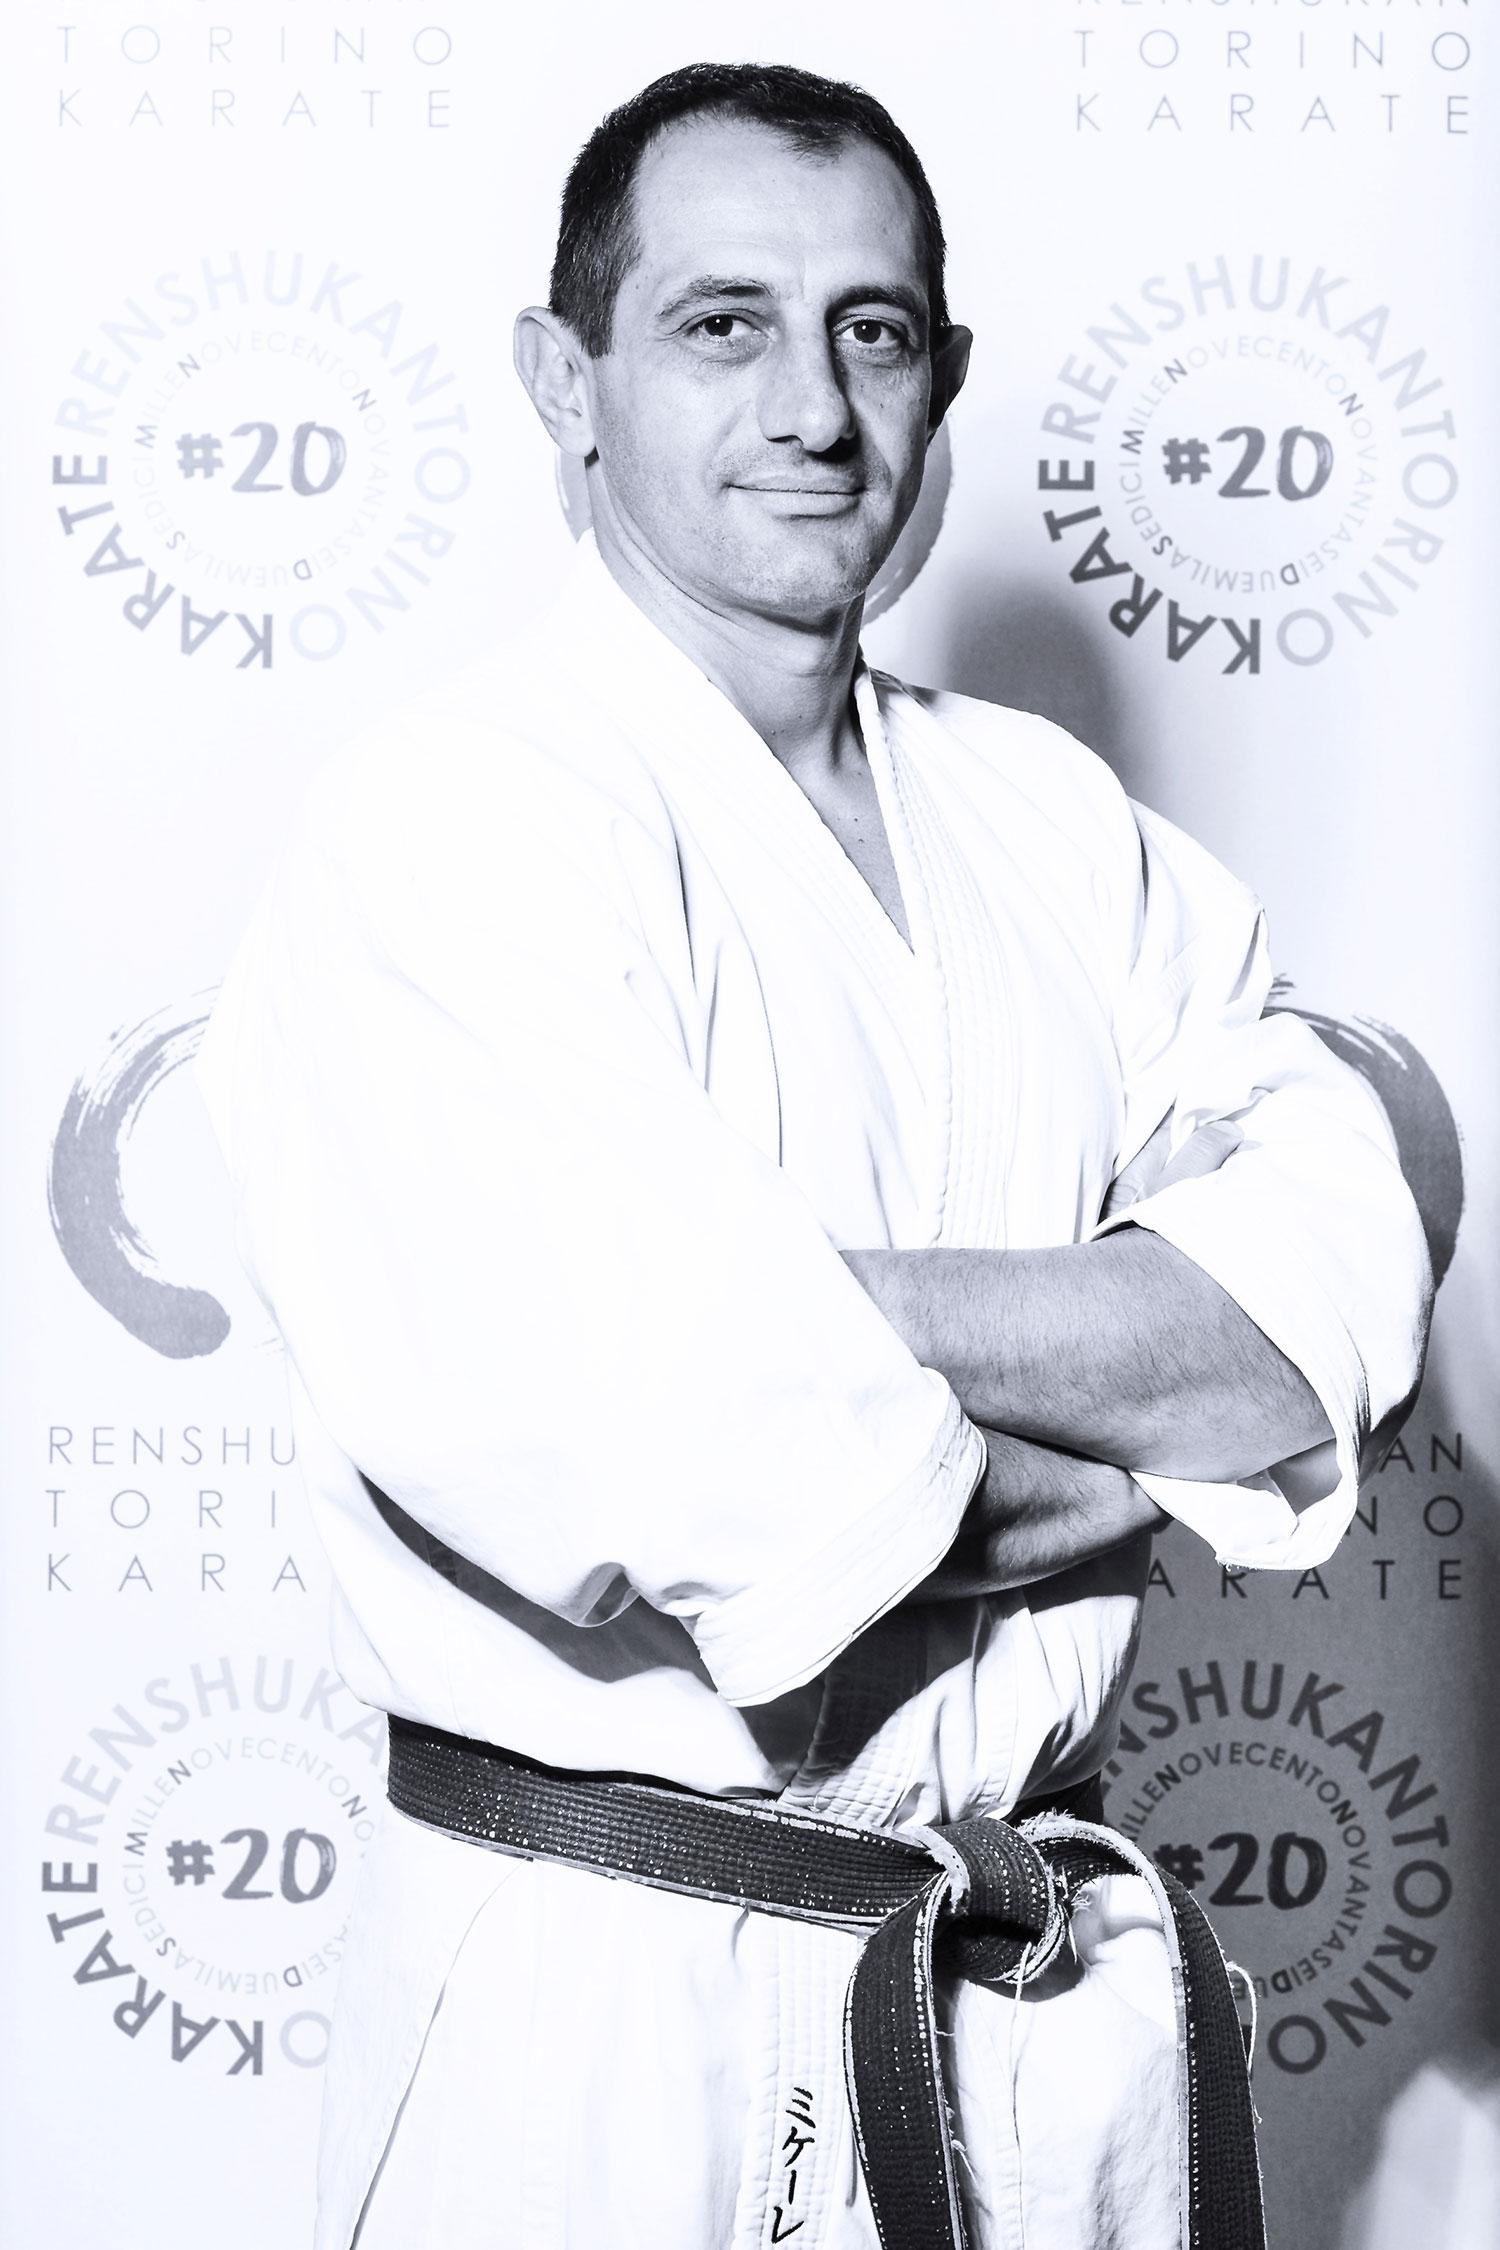 Michele Magrì